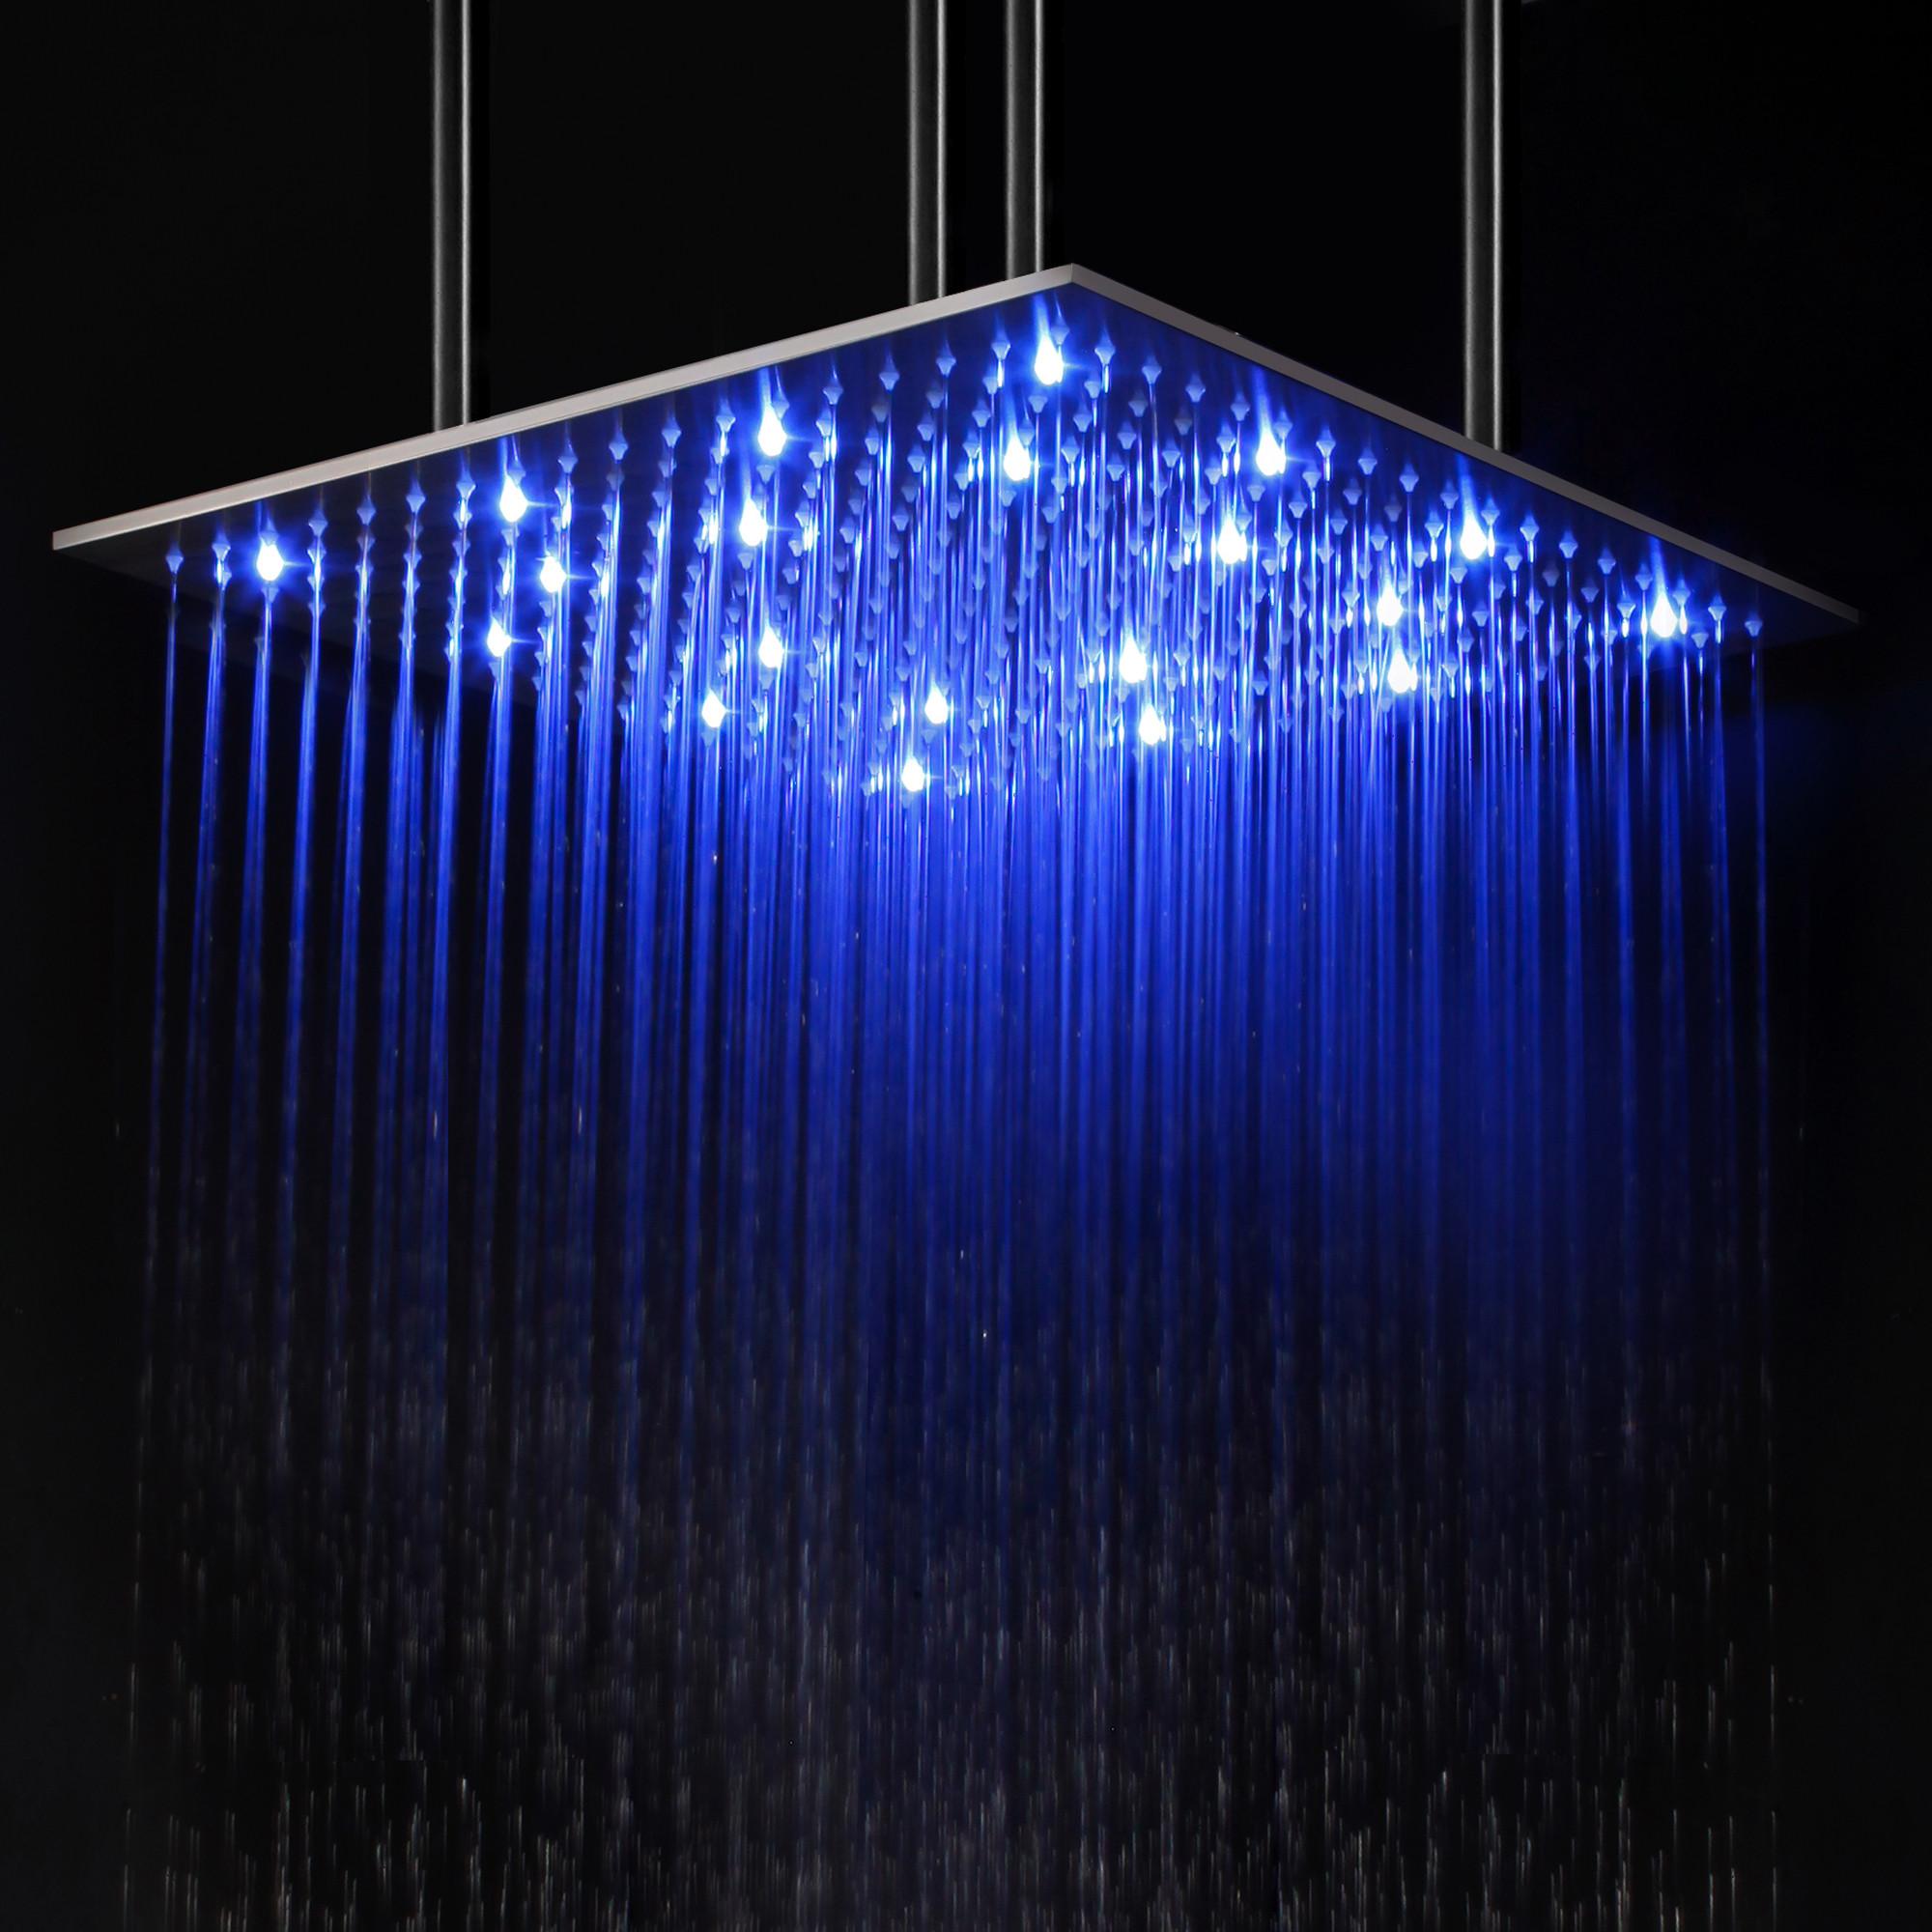 ALFI brand LED20S 20 Inch Square Multi Color LED Rain Shower Head